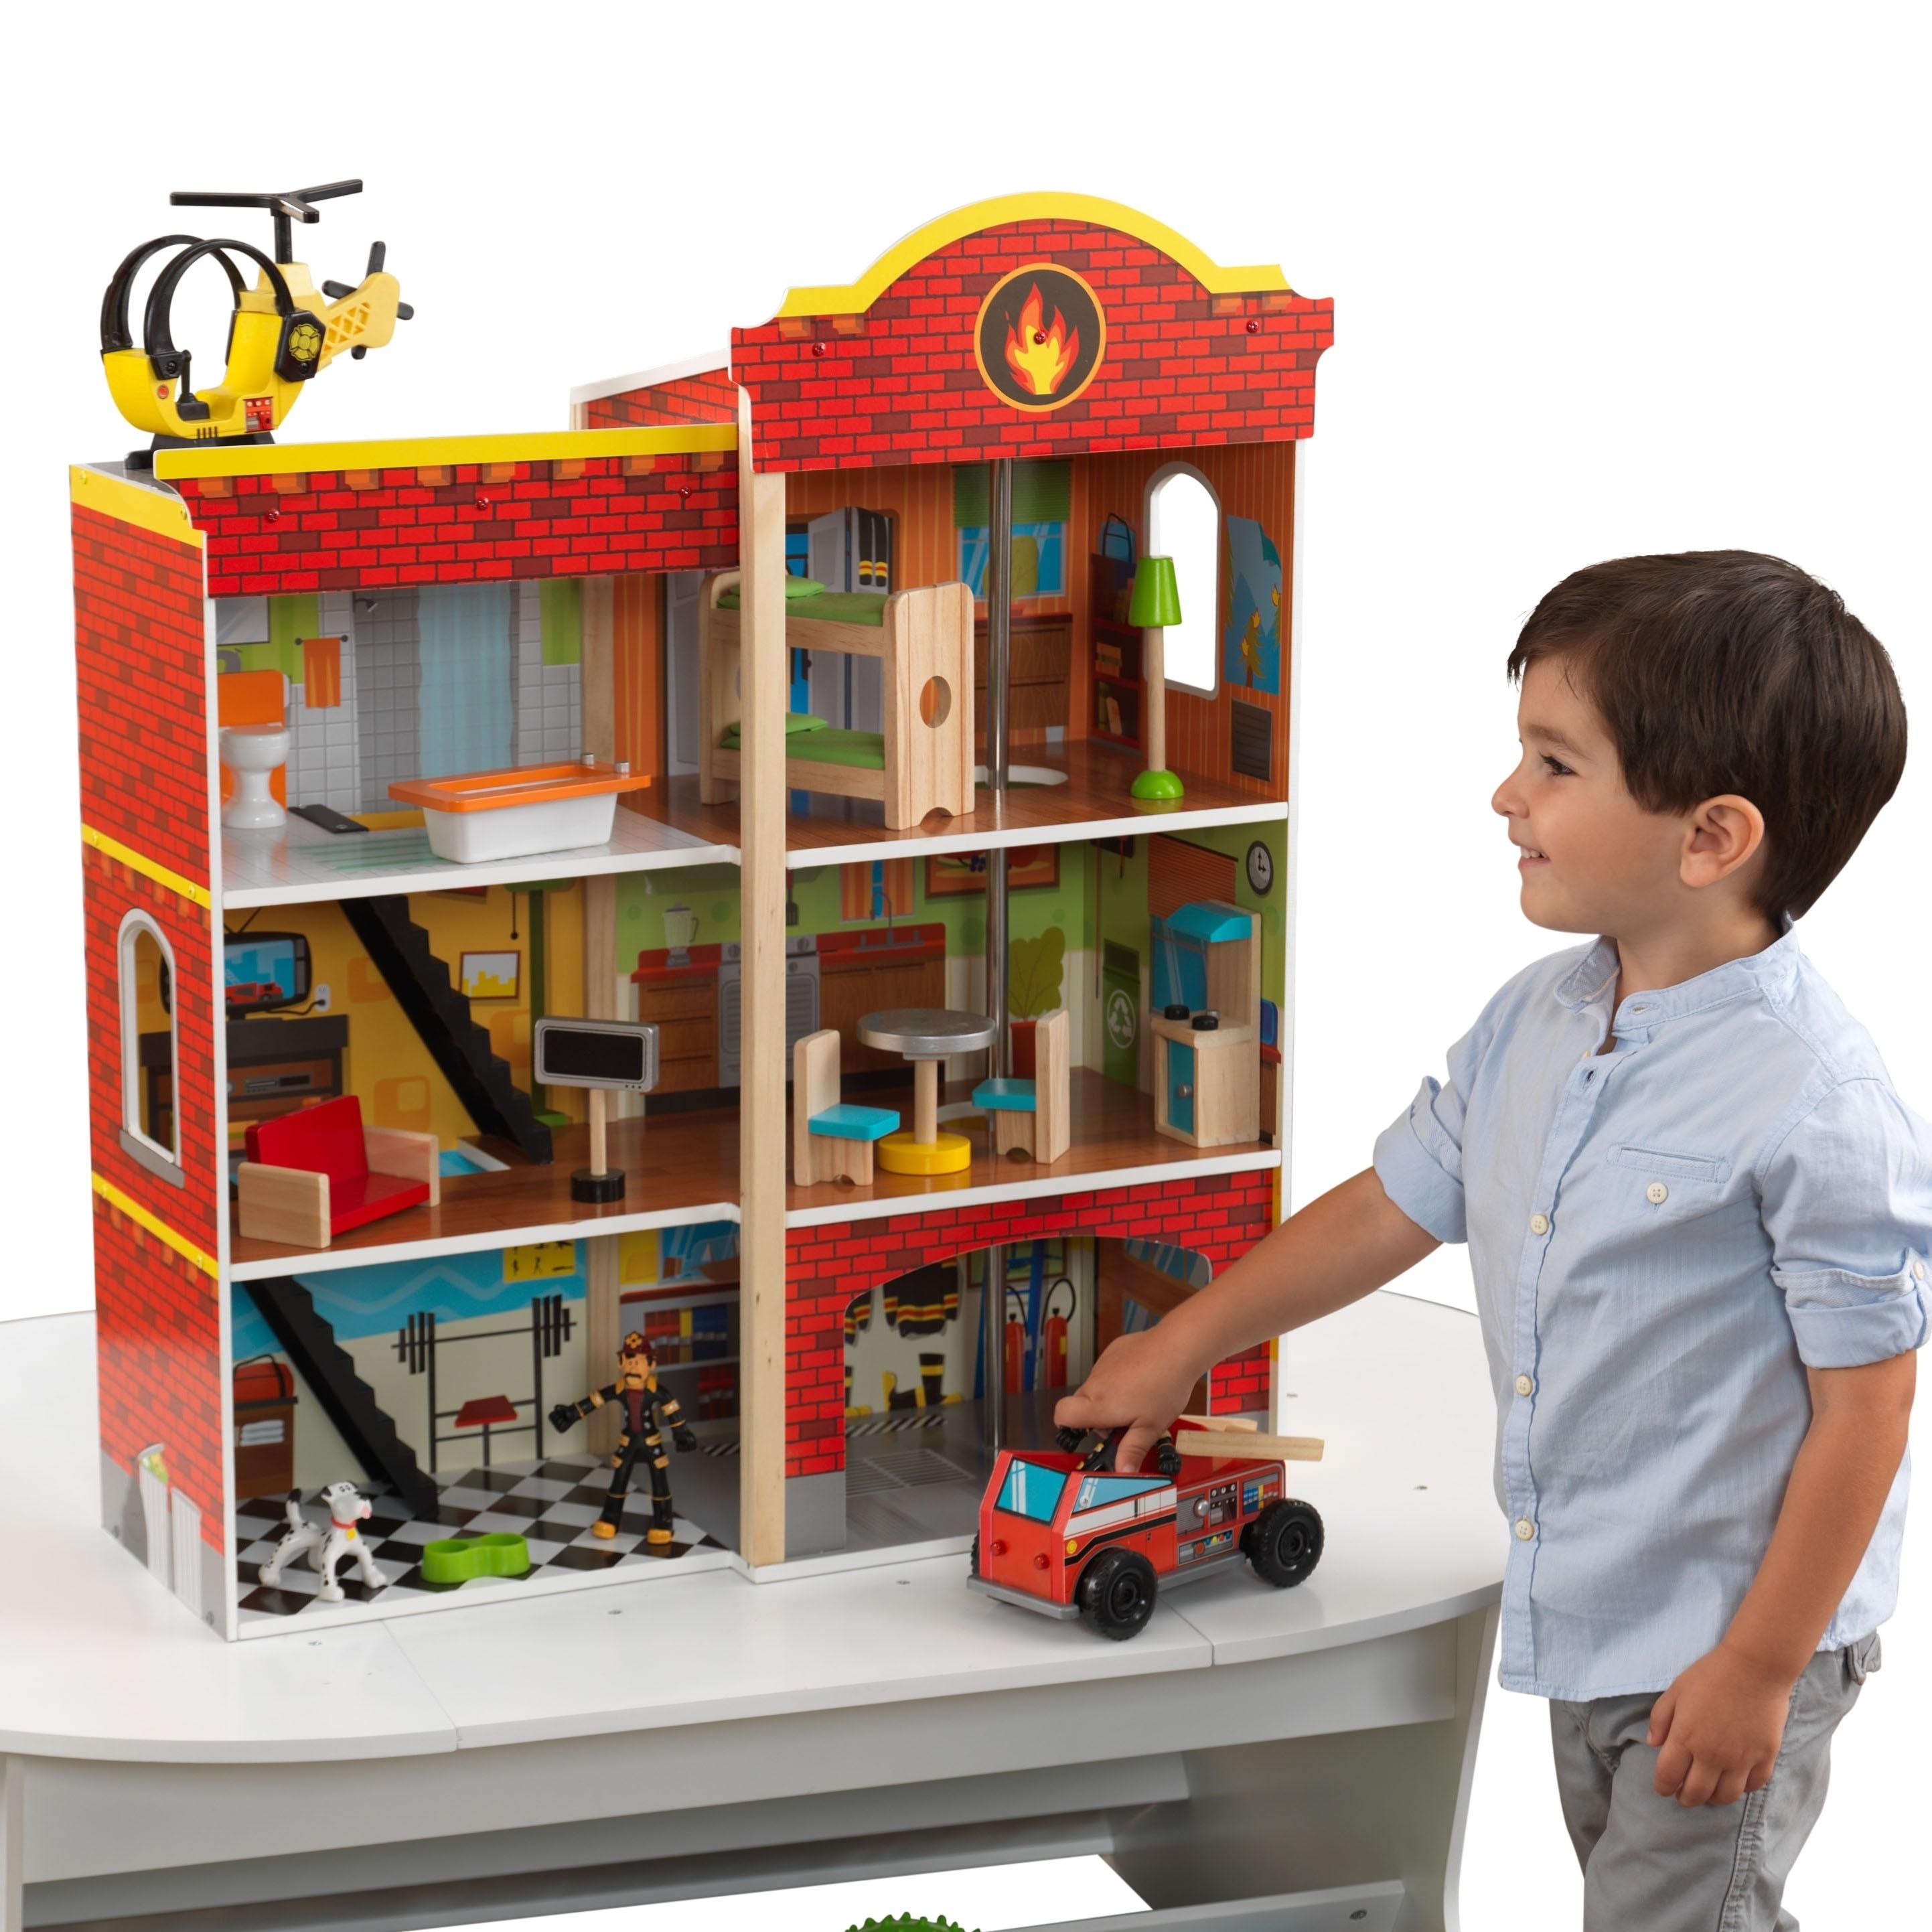 KidKraft 3-story Wooden Fire Station Set